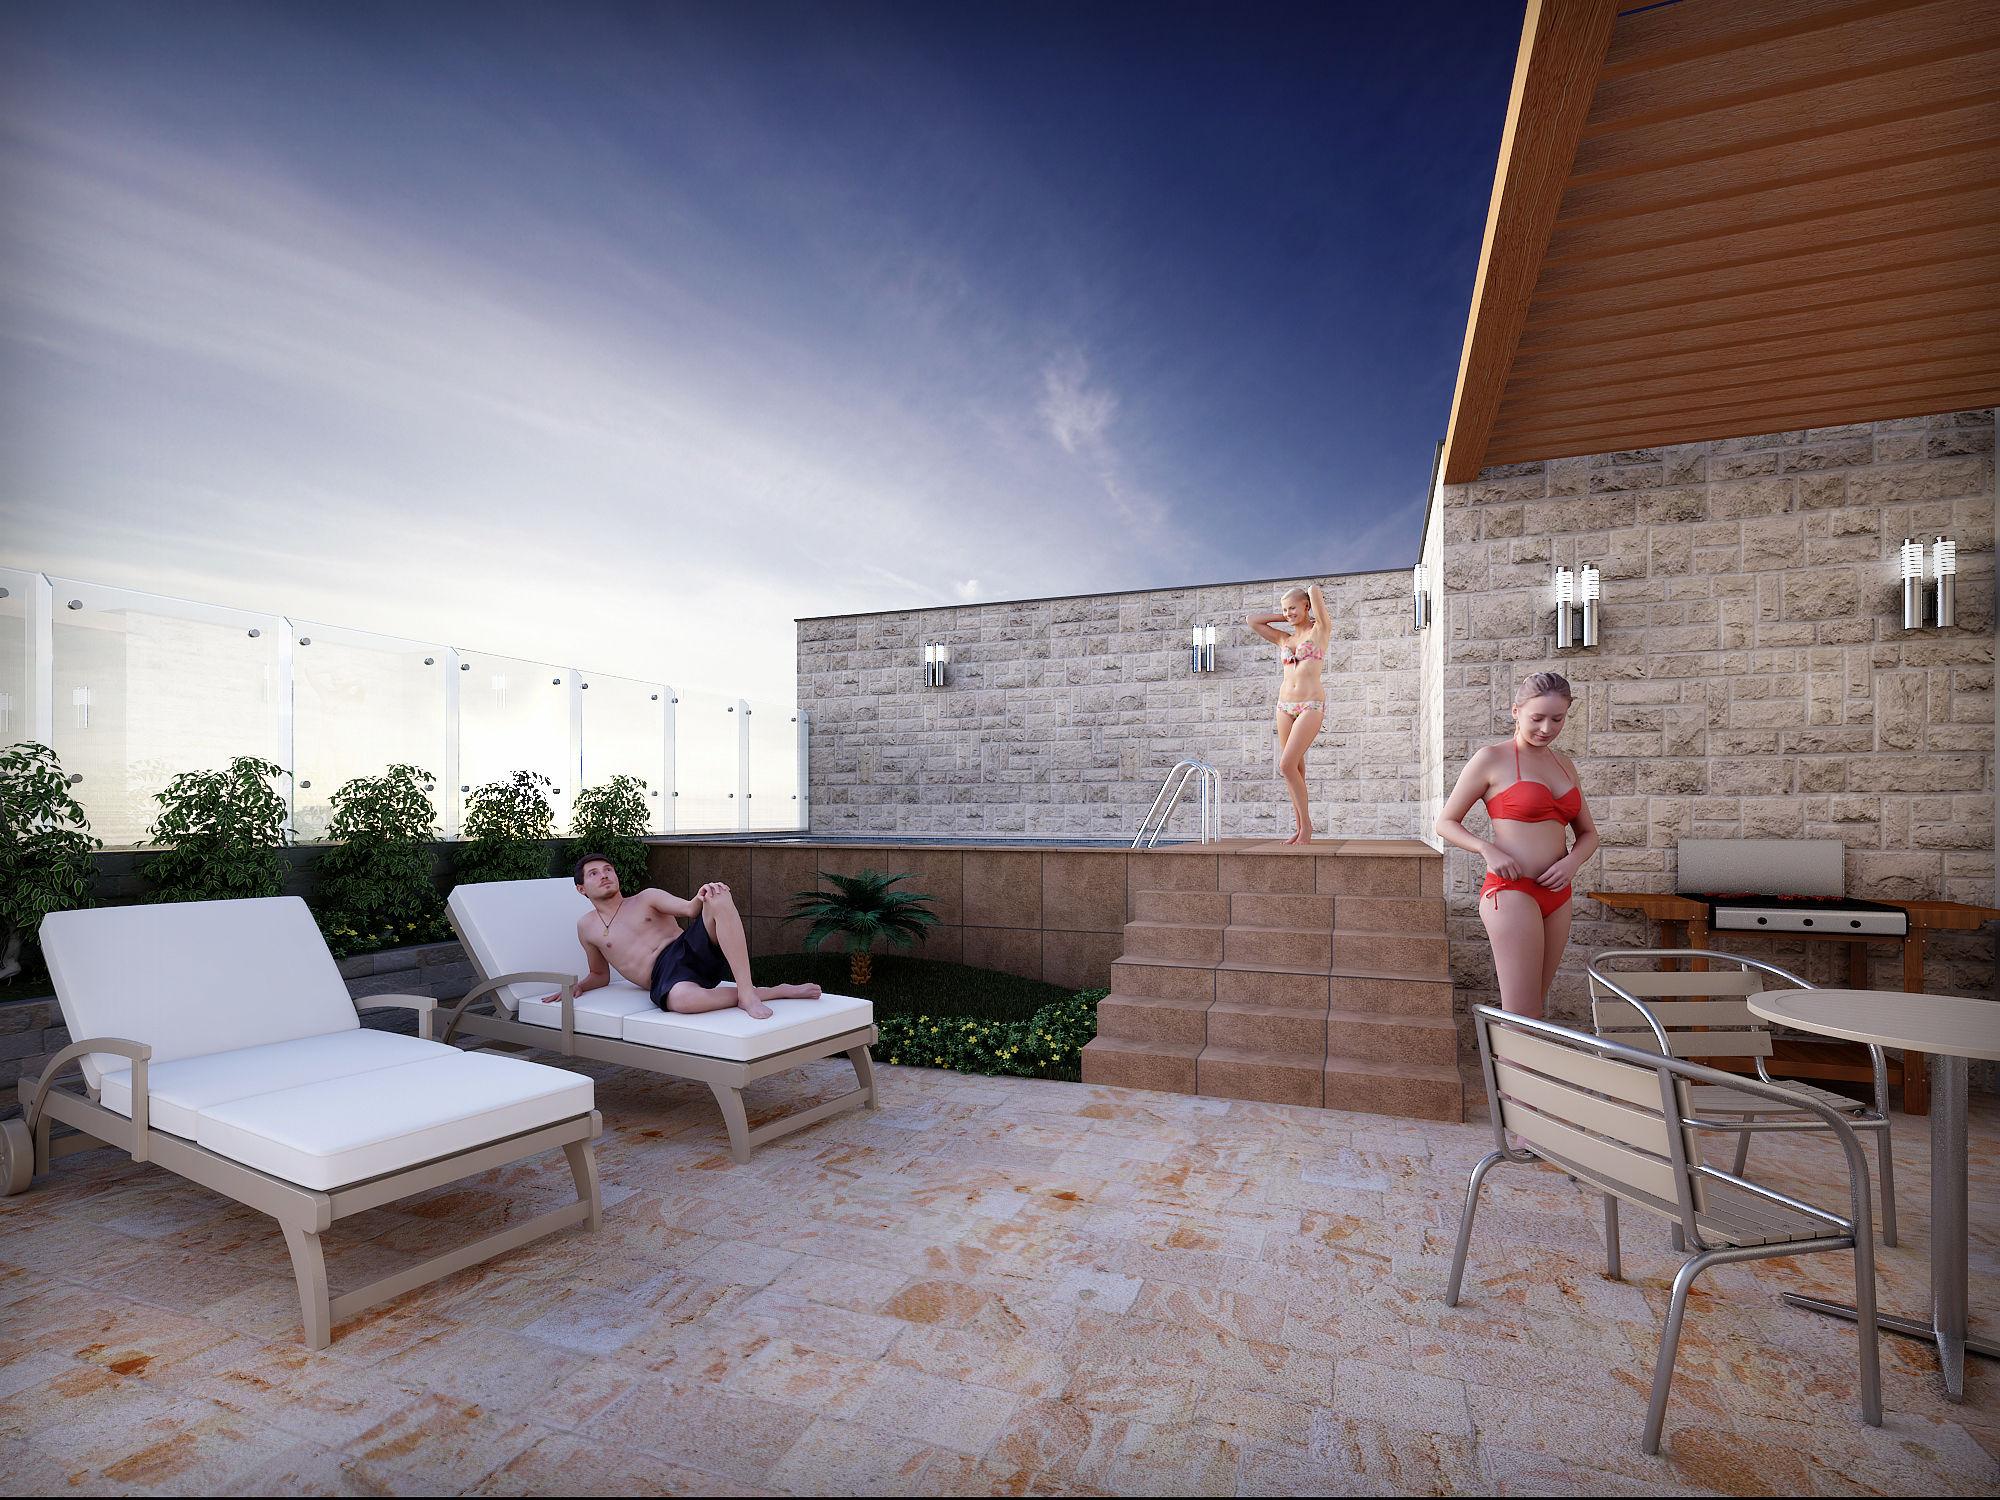 Pool-terrace-3500-3500